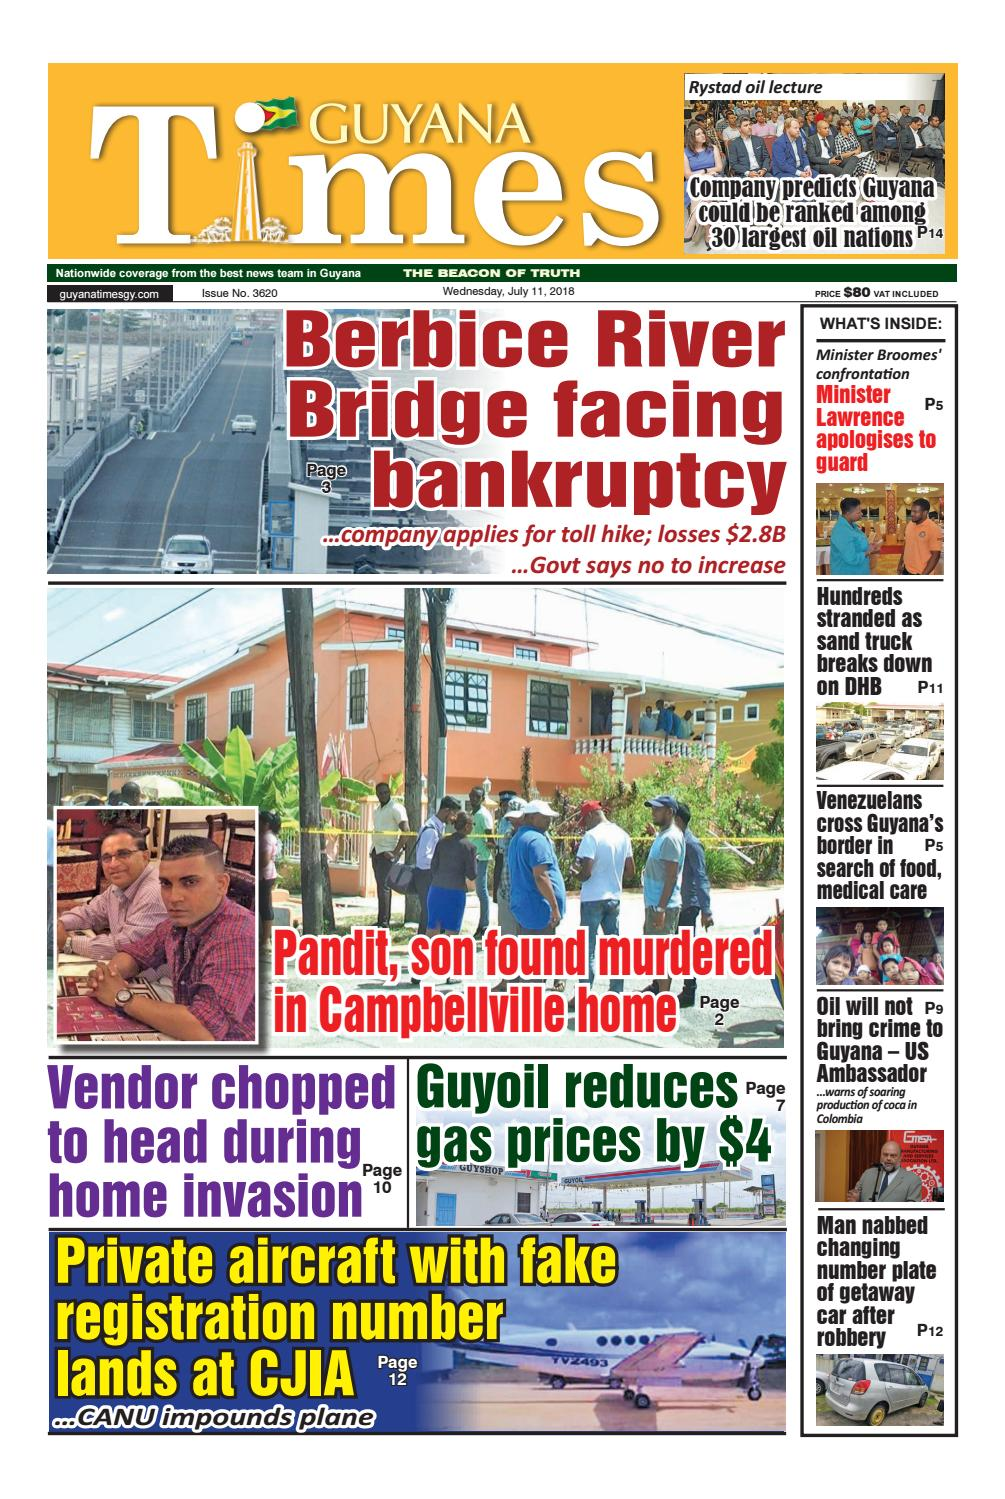 Guyana Times Wednesday, July 11, 2018 by Gytimes - issuu